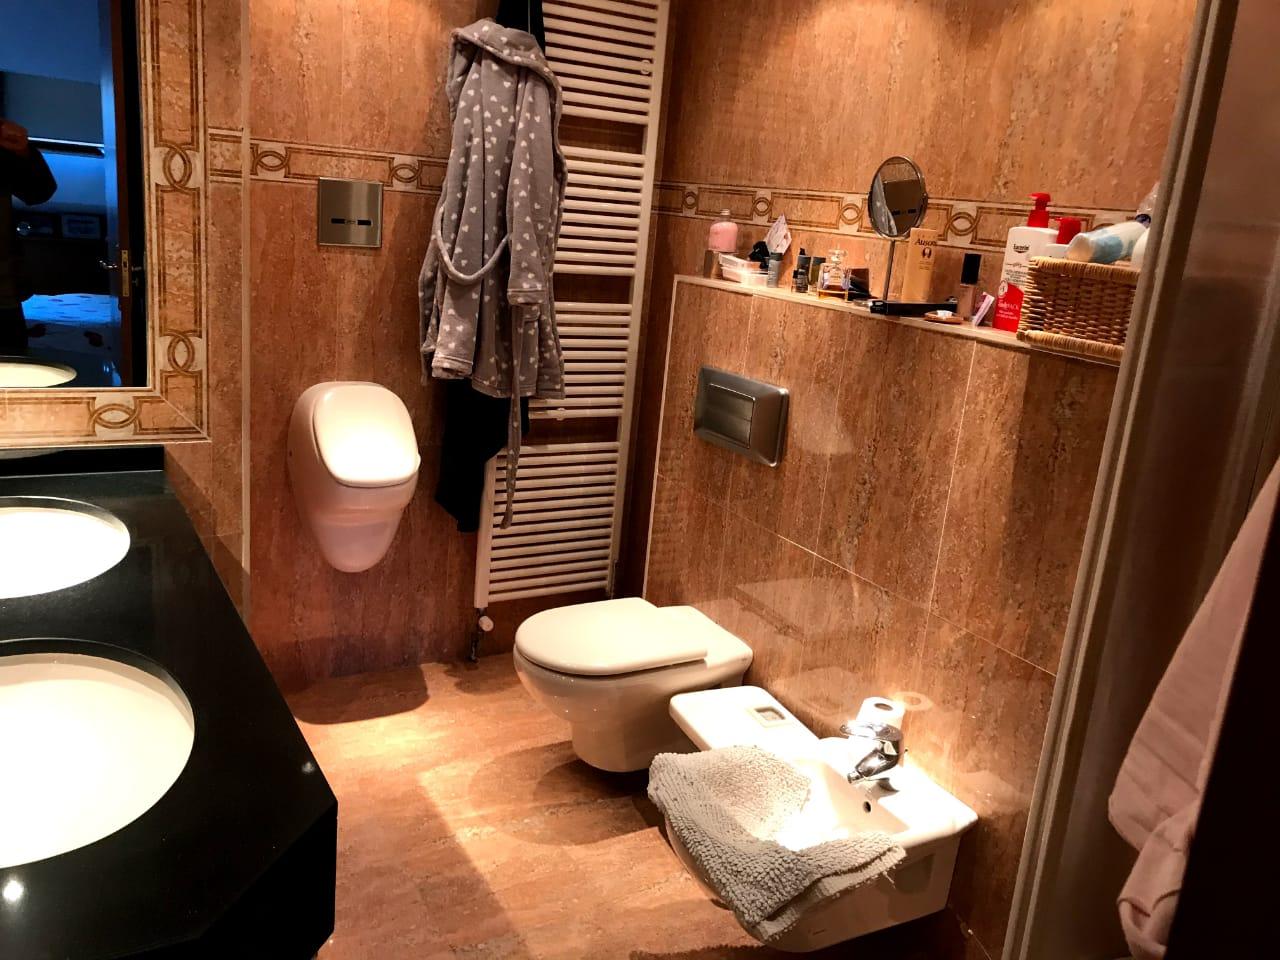 Dúplex en venda a Ordino, 4 habitacions, 200 metres